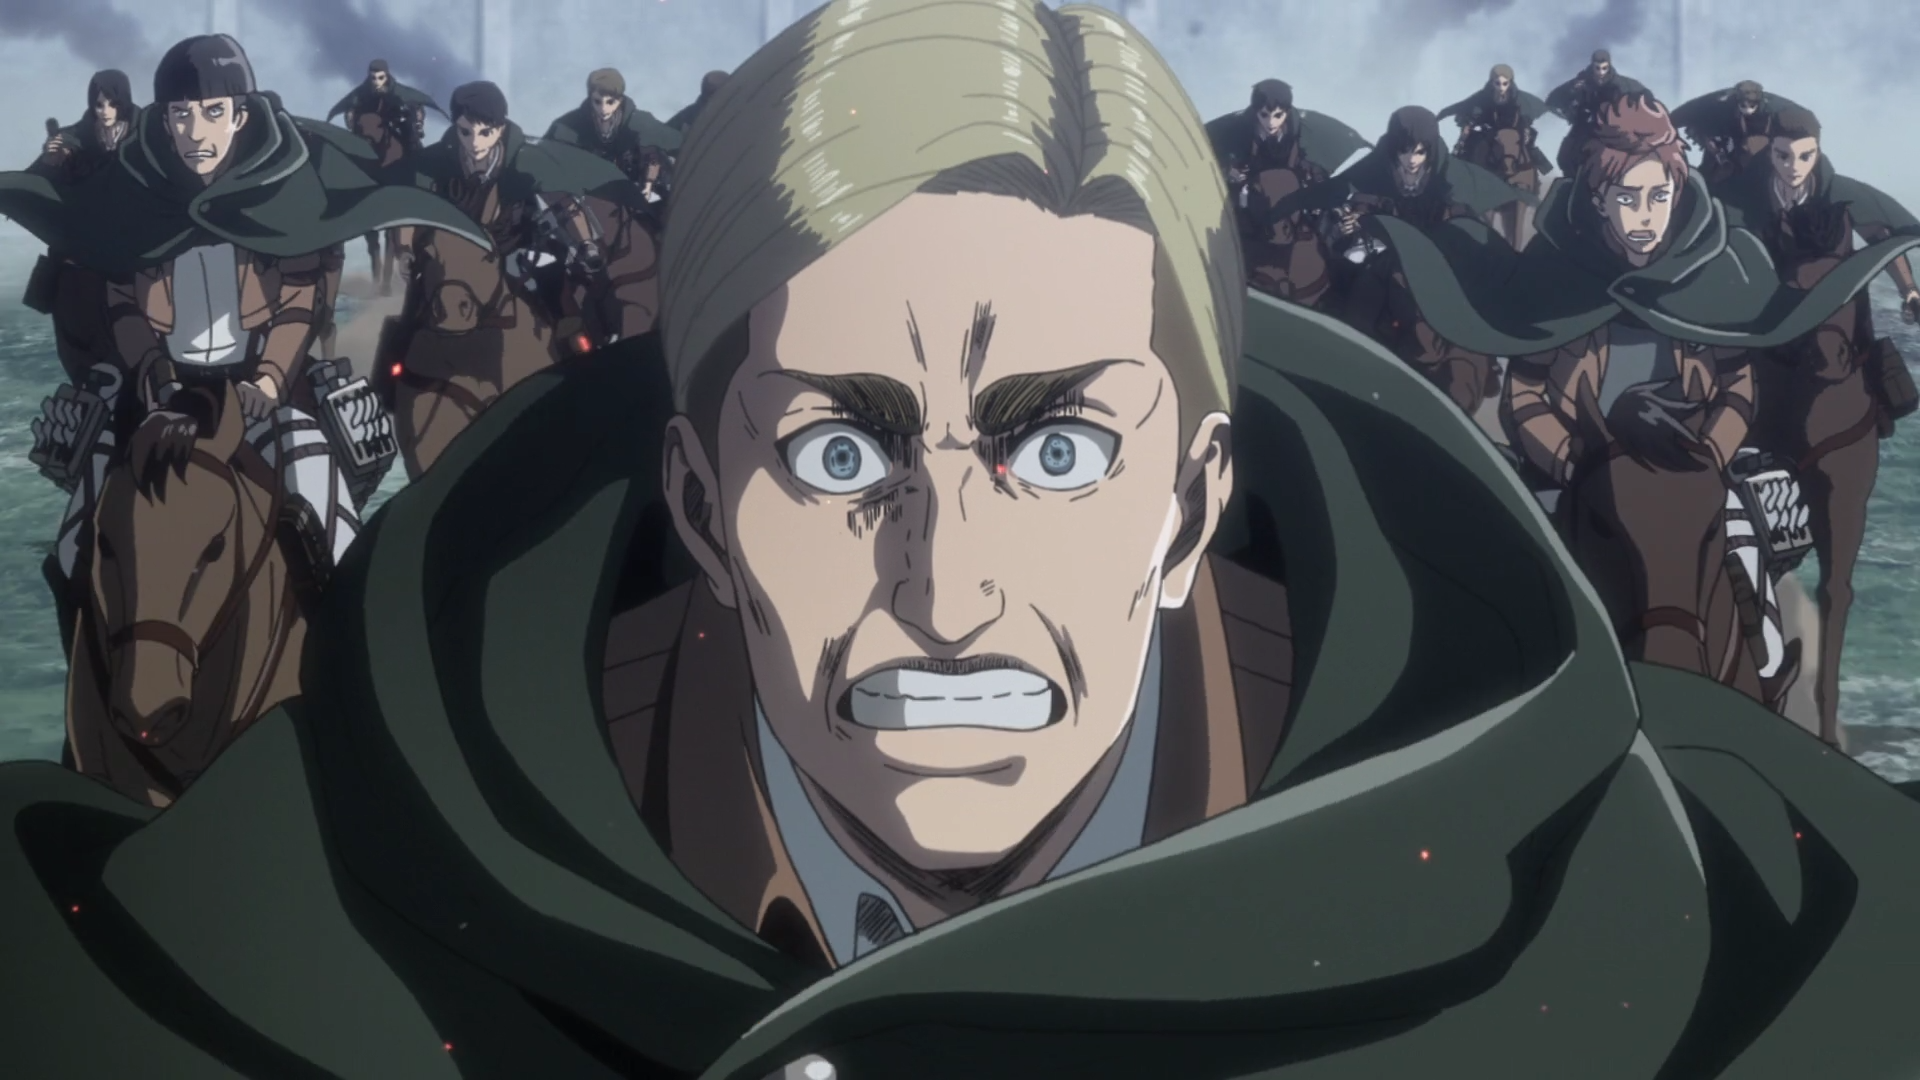 Attack on Titan Season 3 Pt. 2 Erwin charge 8Bit/Digi